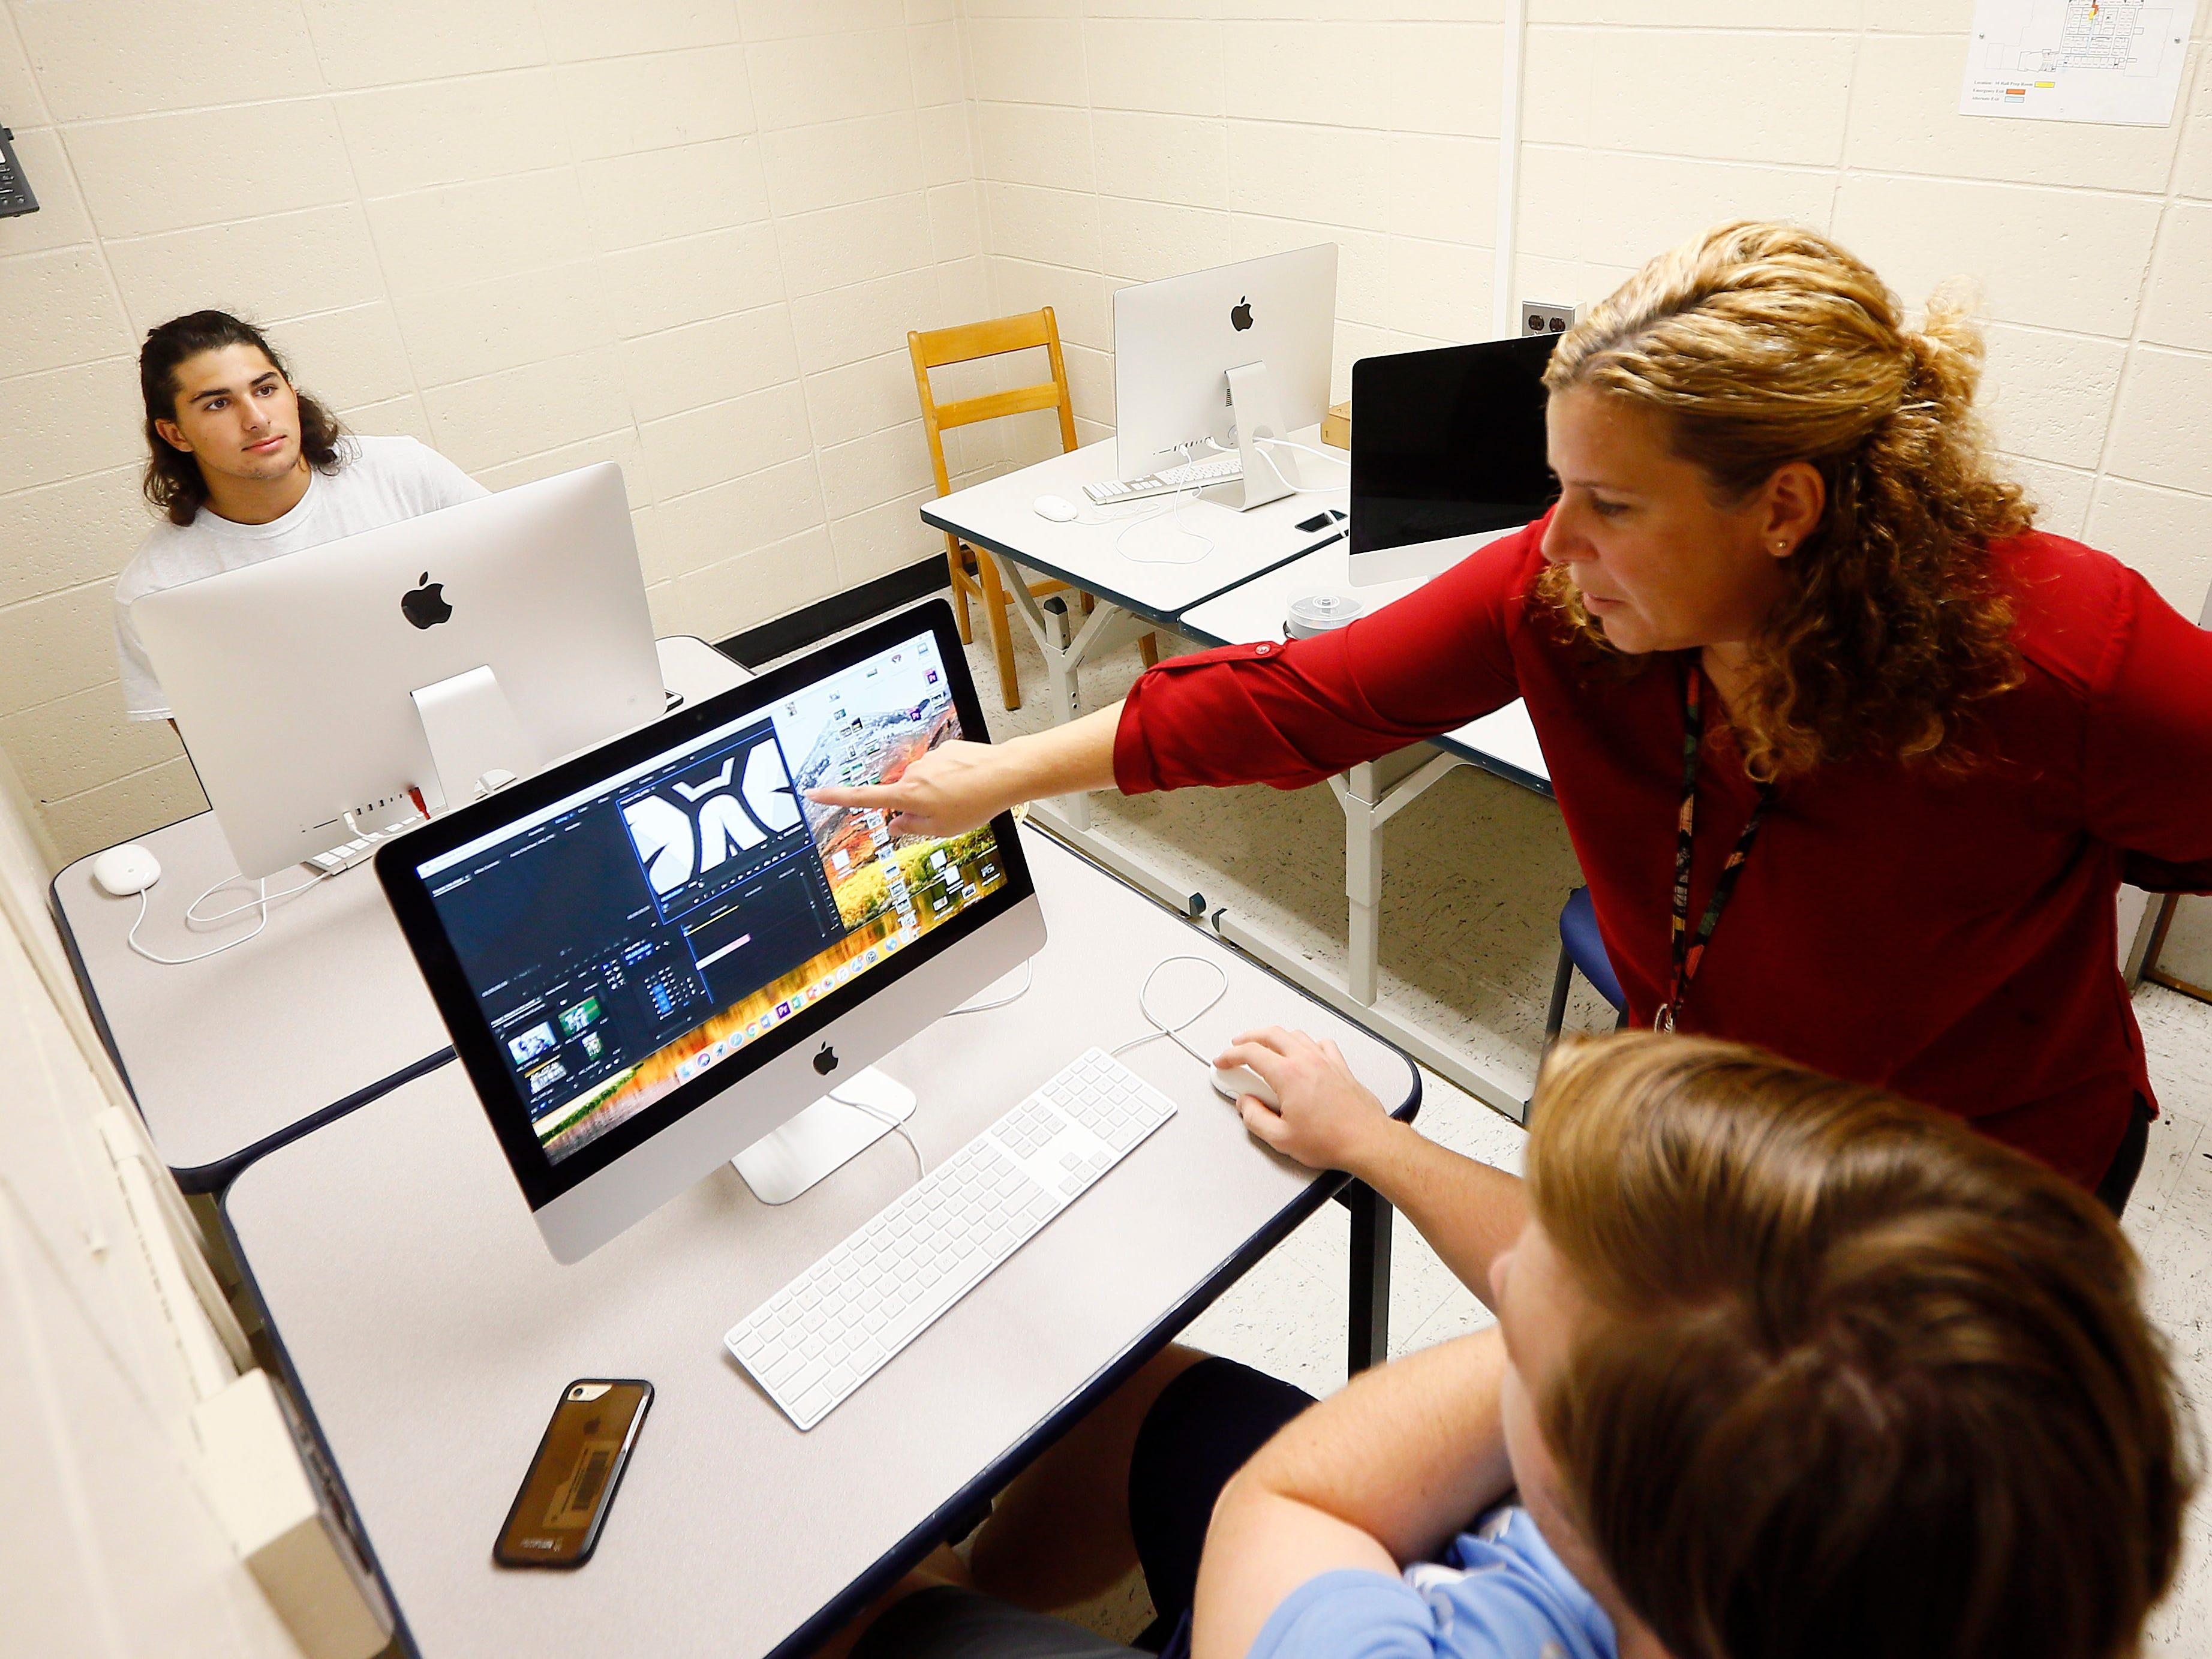 Bury Blitz: Roxbury students bringing high tech to athletic fields